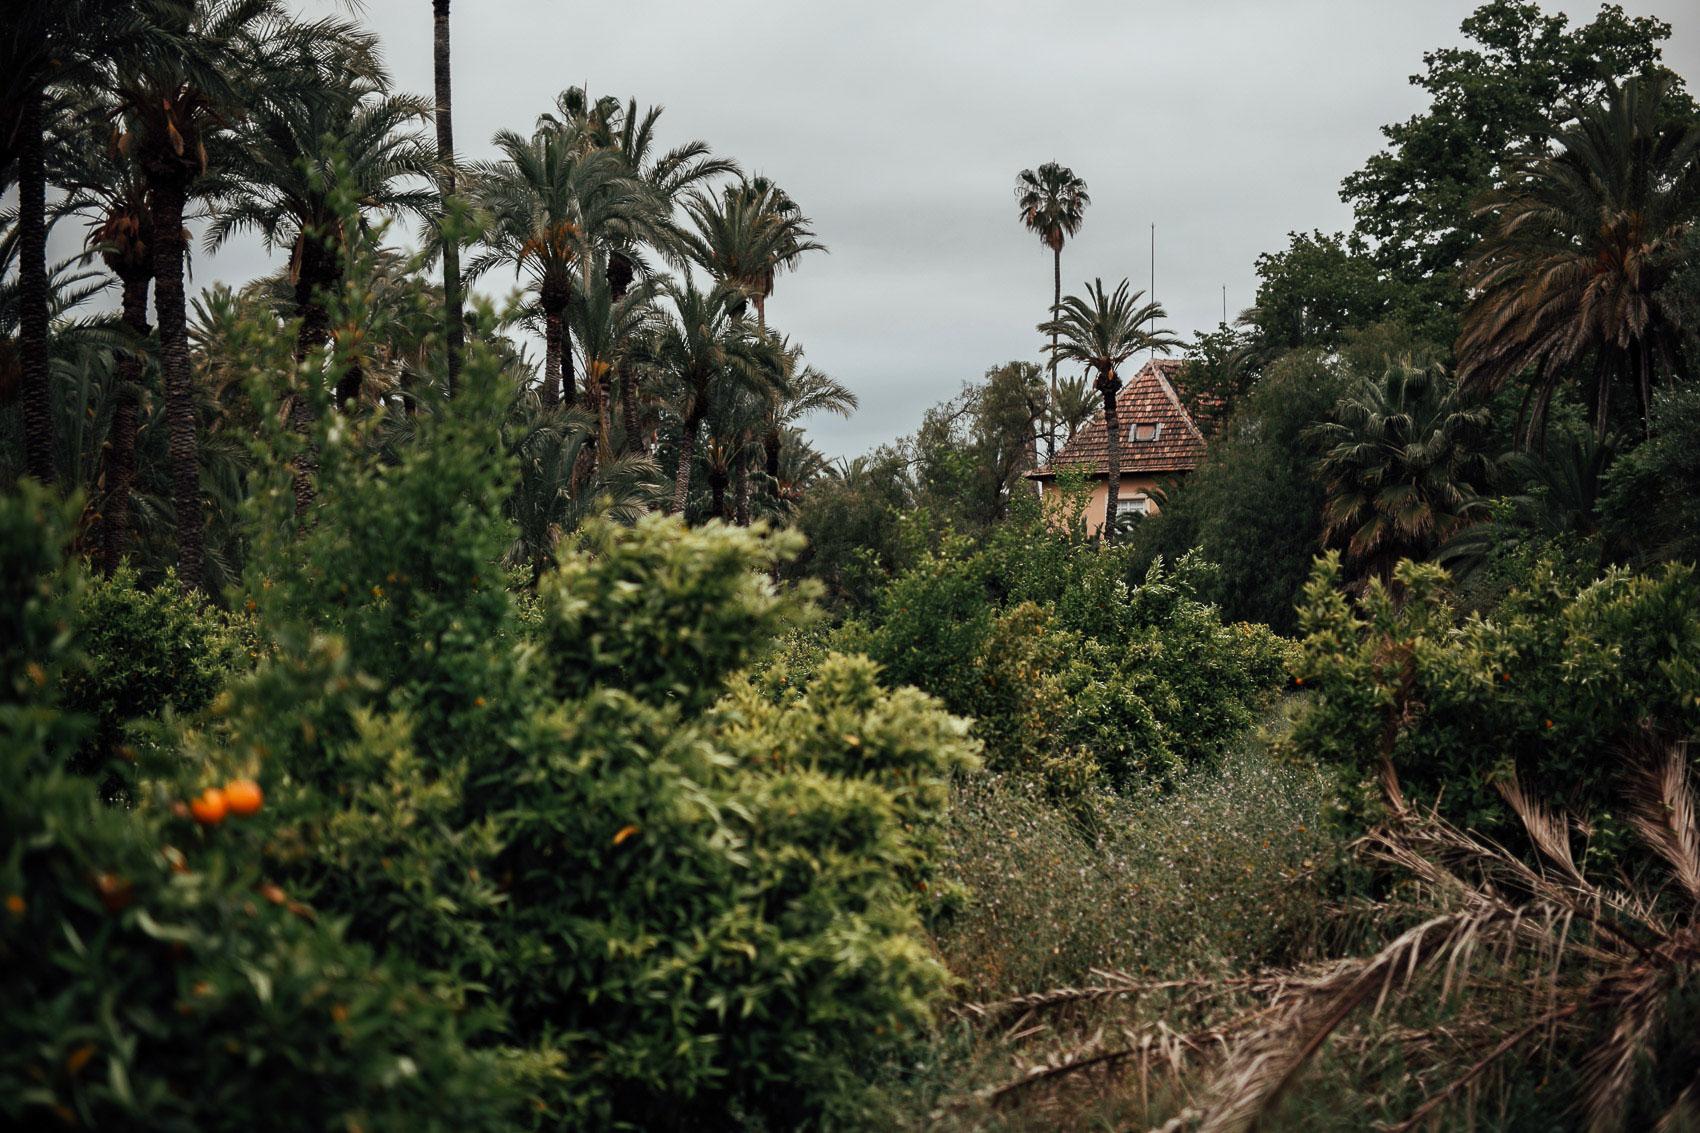 parque marquesa exterior naturaleza palmeras